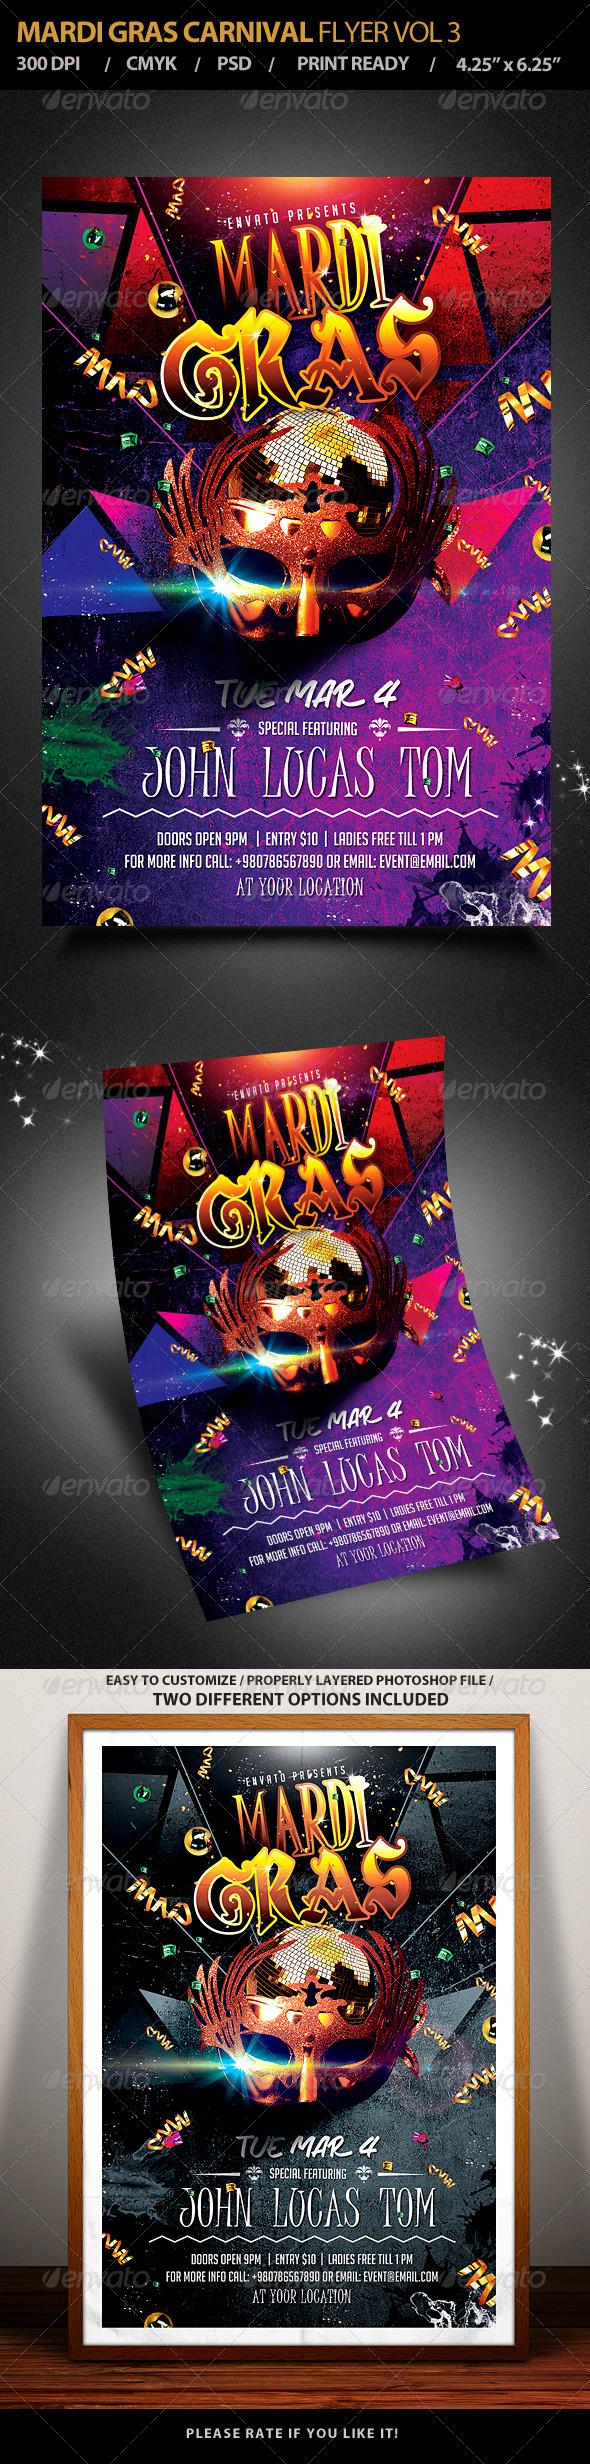 GraphicRiver Mardi Gras Carnival Party Flyer Vol 3 6485036